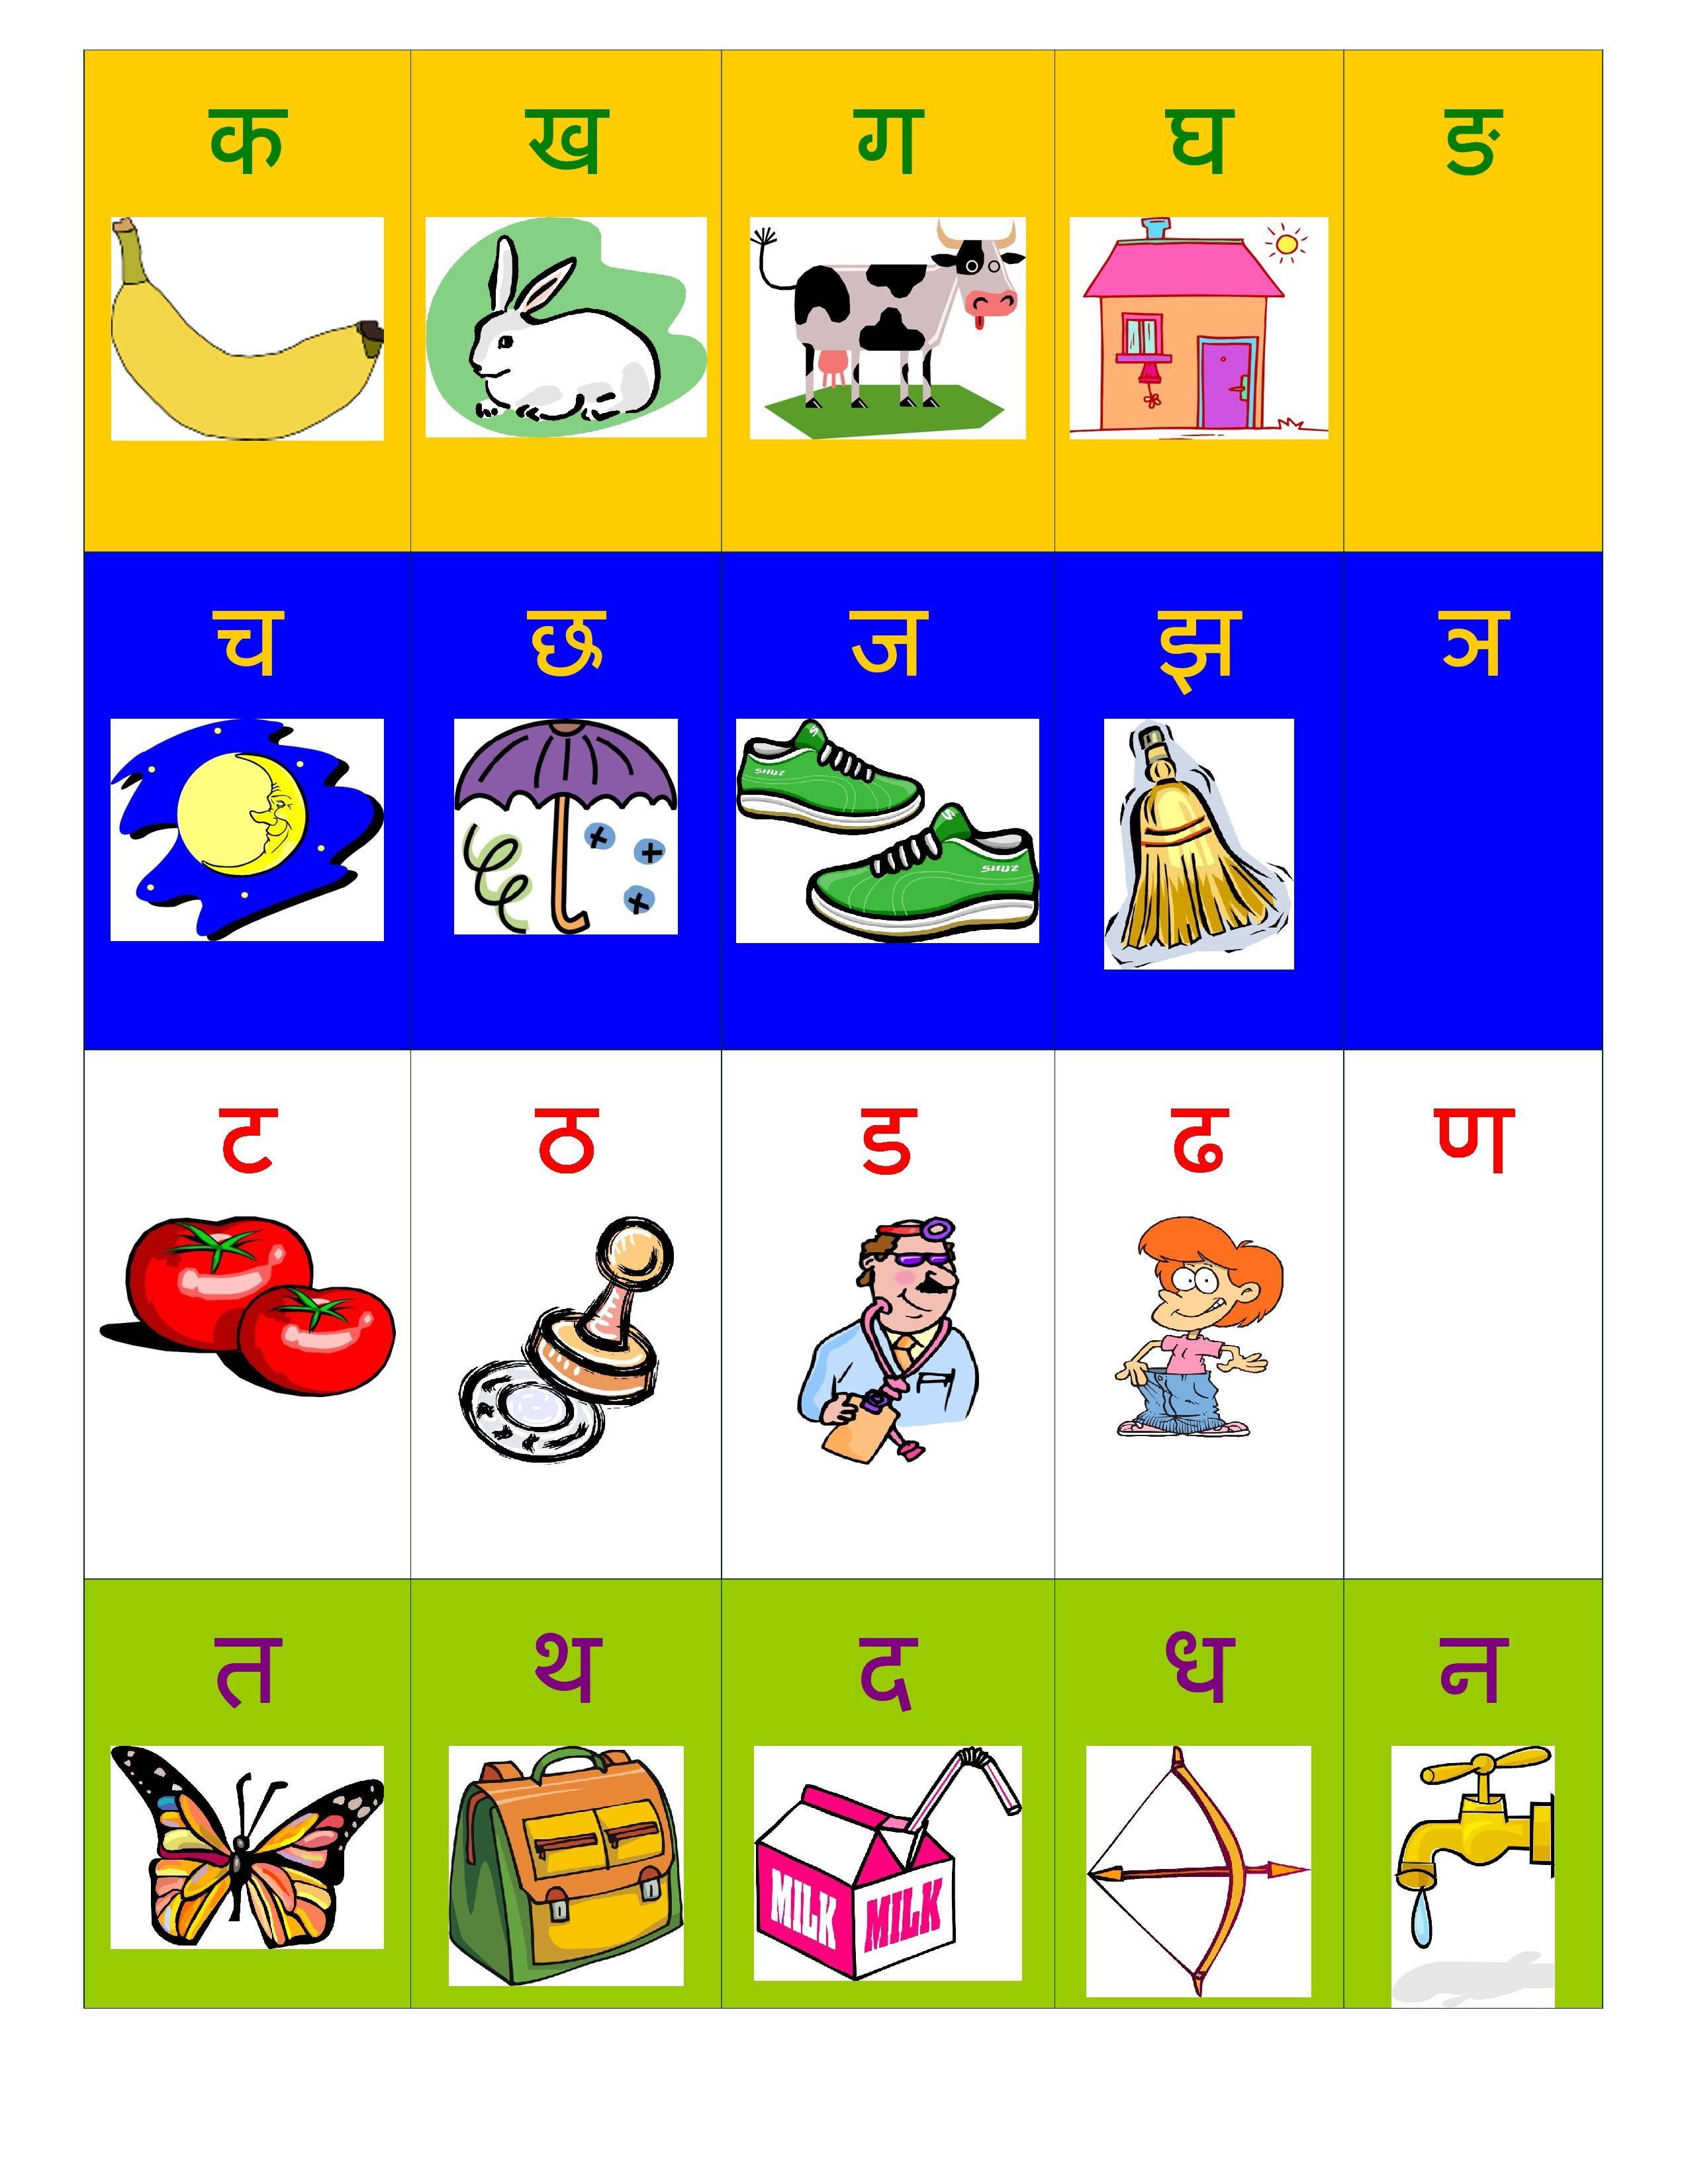 वर्णमाला VARNAMALA (Hindi Alphabets) - Varn ke Bhed ...